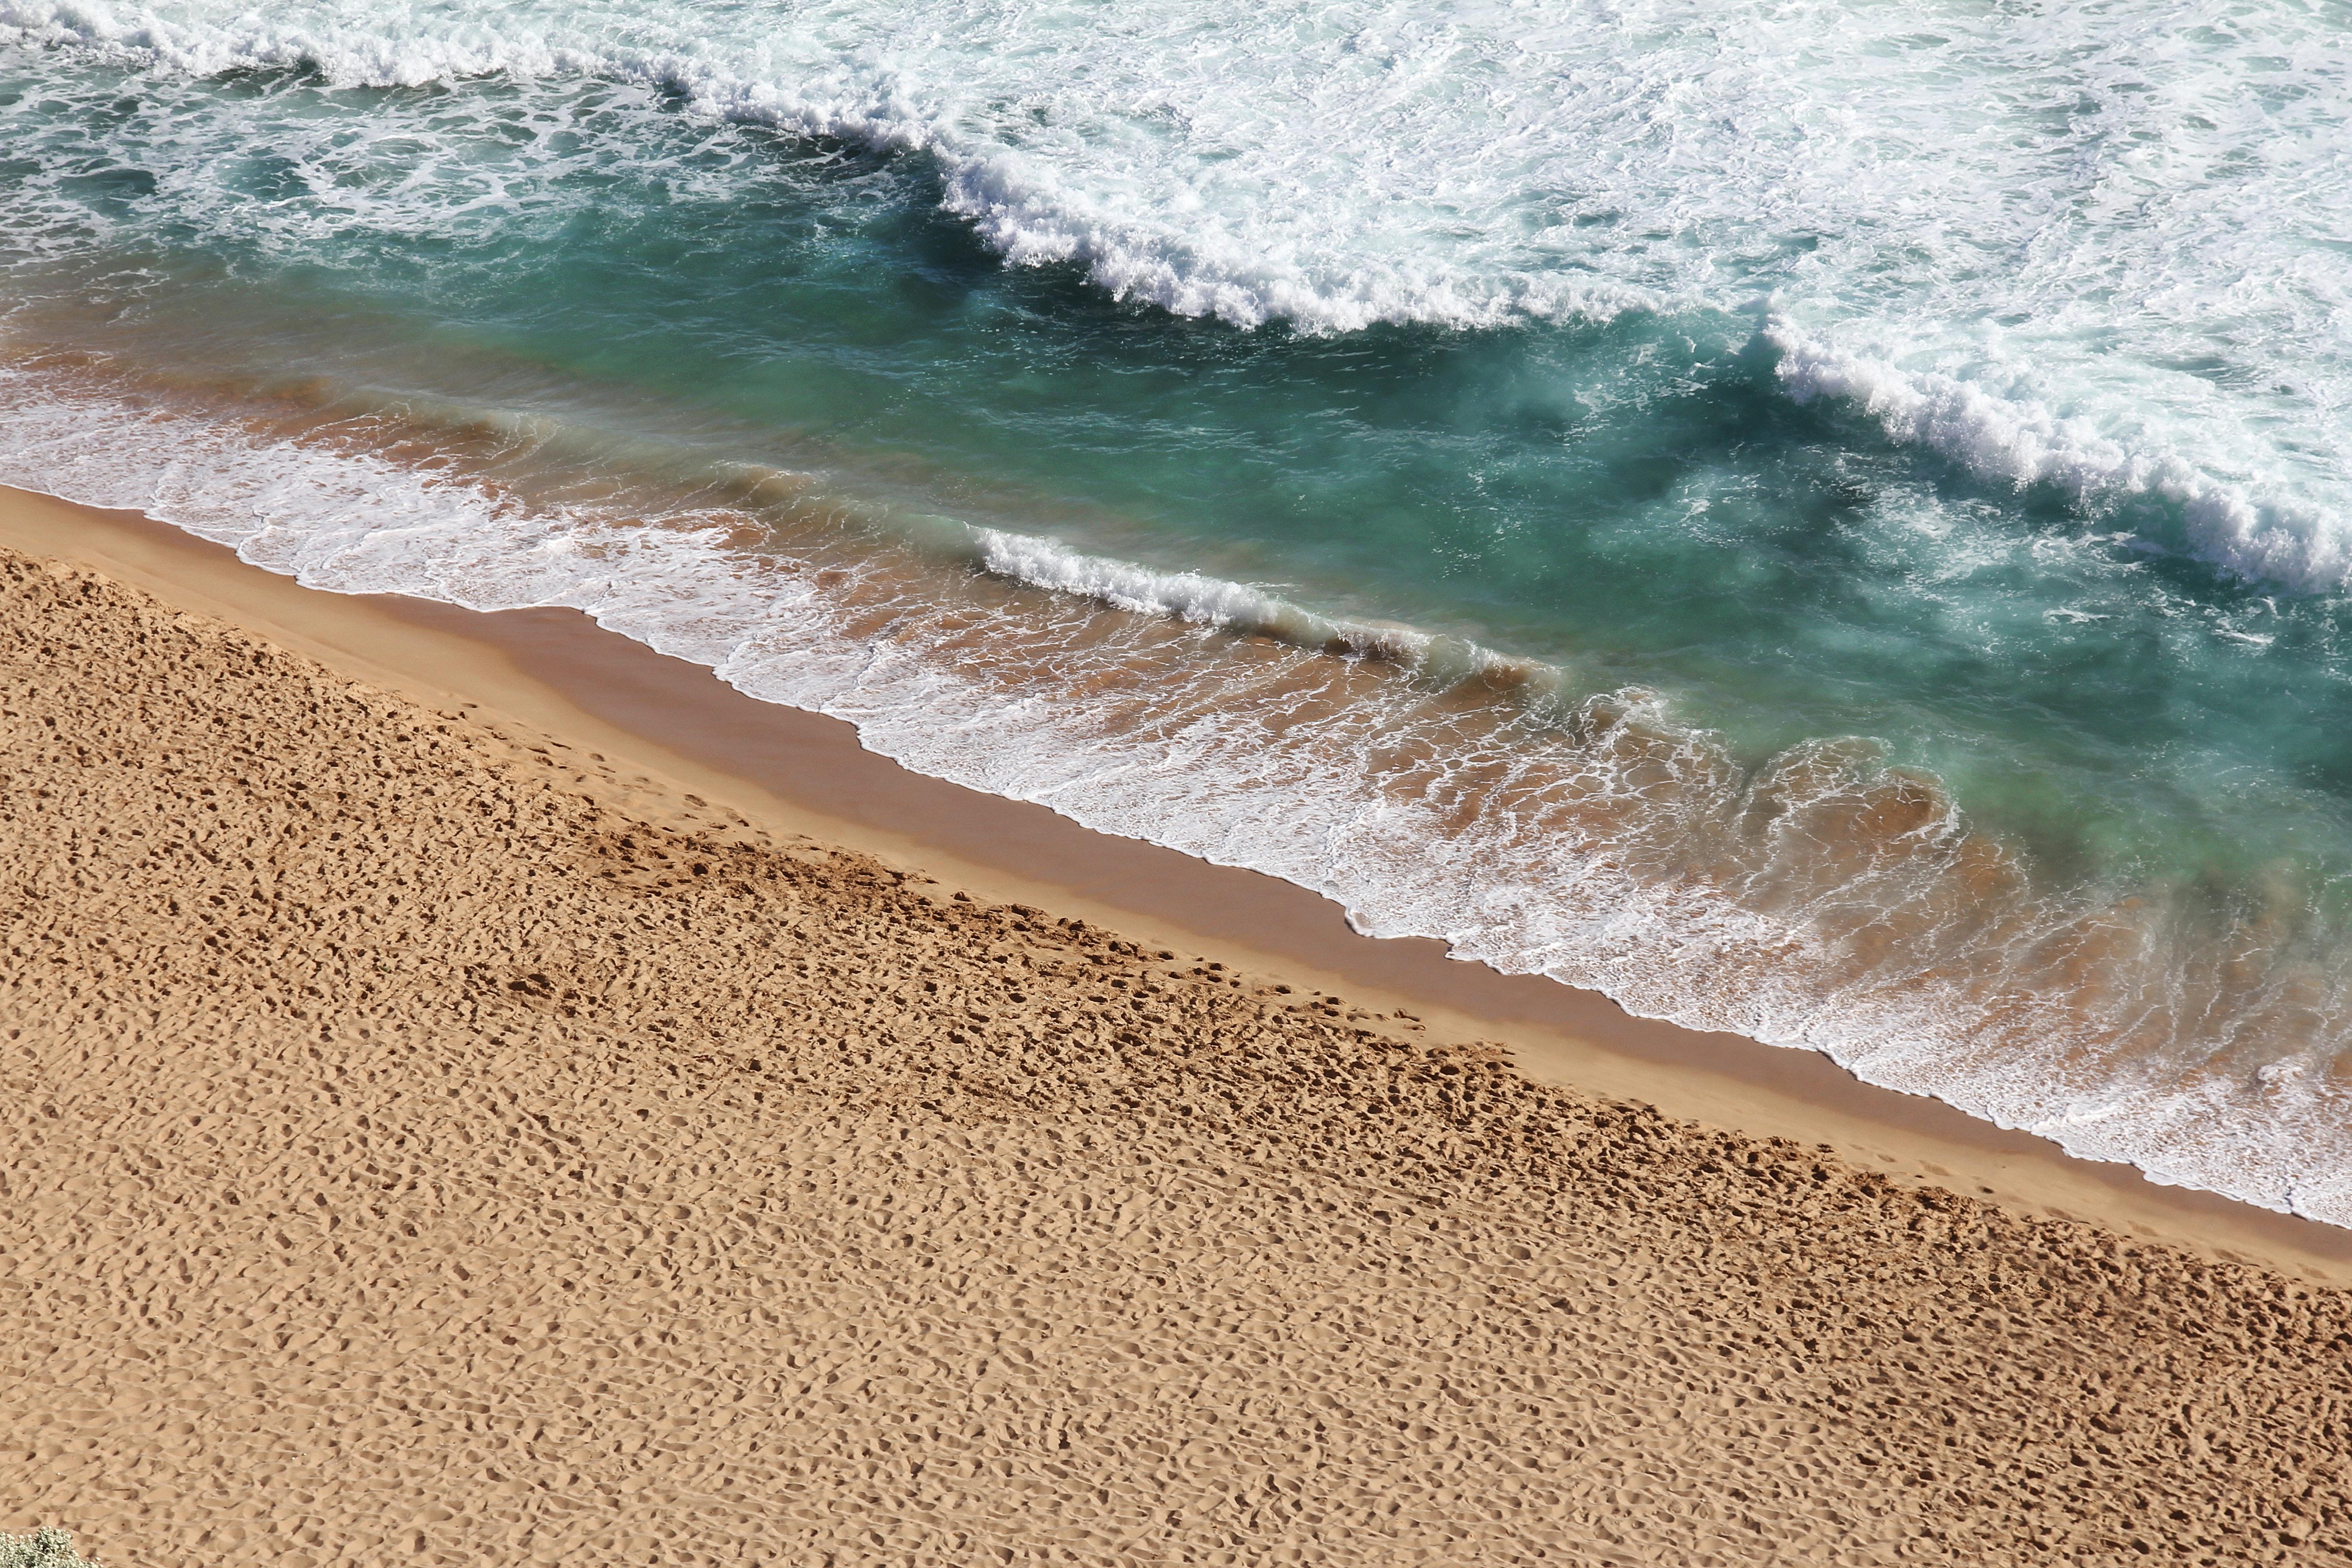 Ocean washing on the sand beach